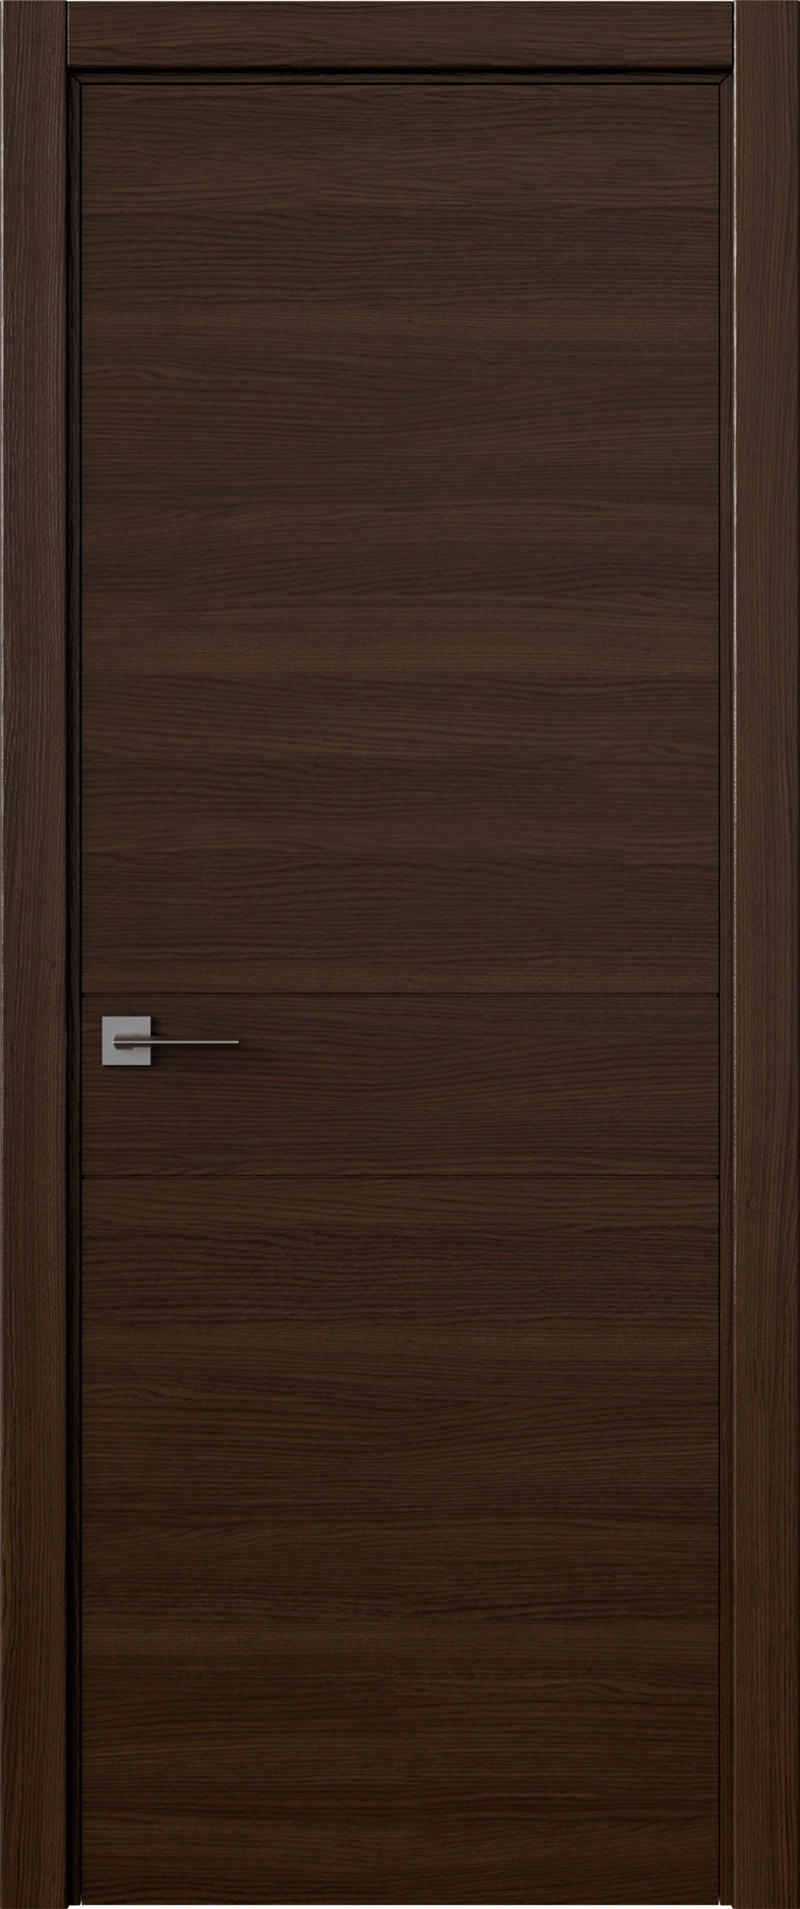 Tivoli И-2 цвет - Дуб торонто Без стекла (ДГ)